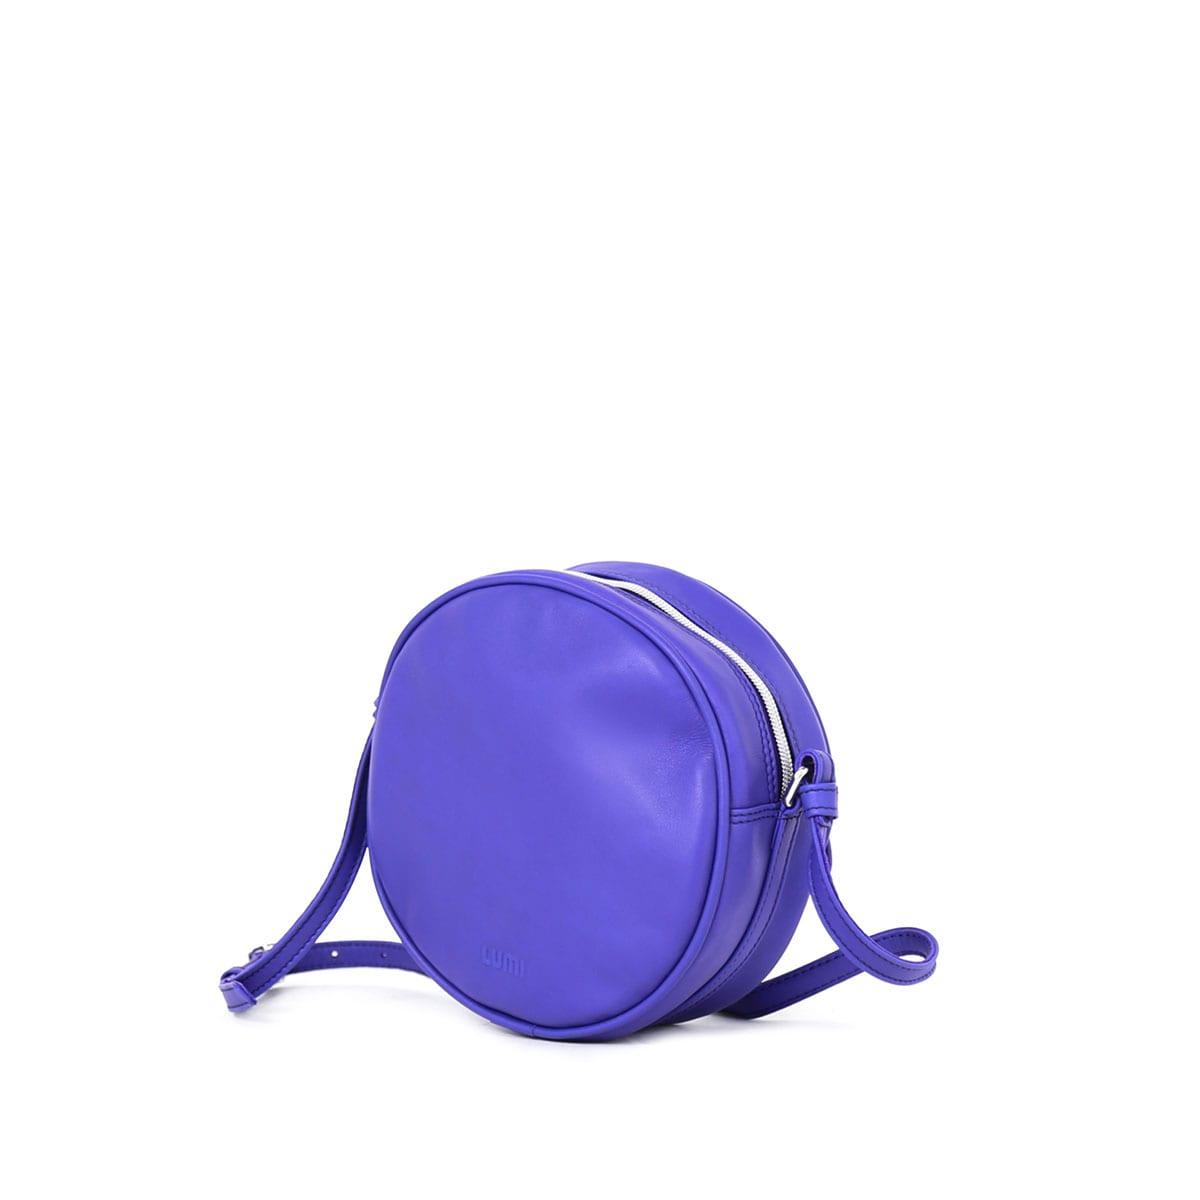 9df1e2cd79 Lila Round Bag Violet – Lumi Accessories